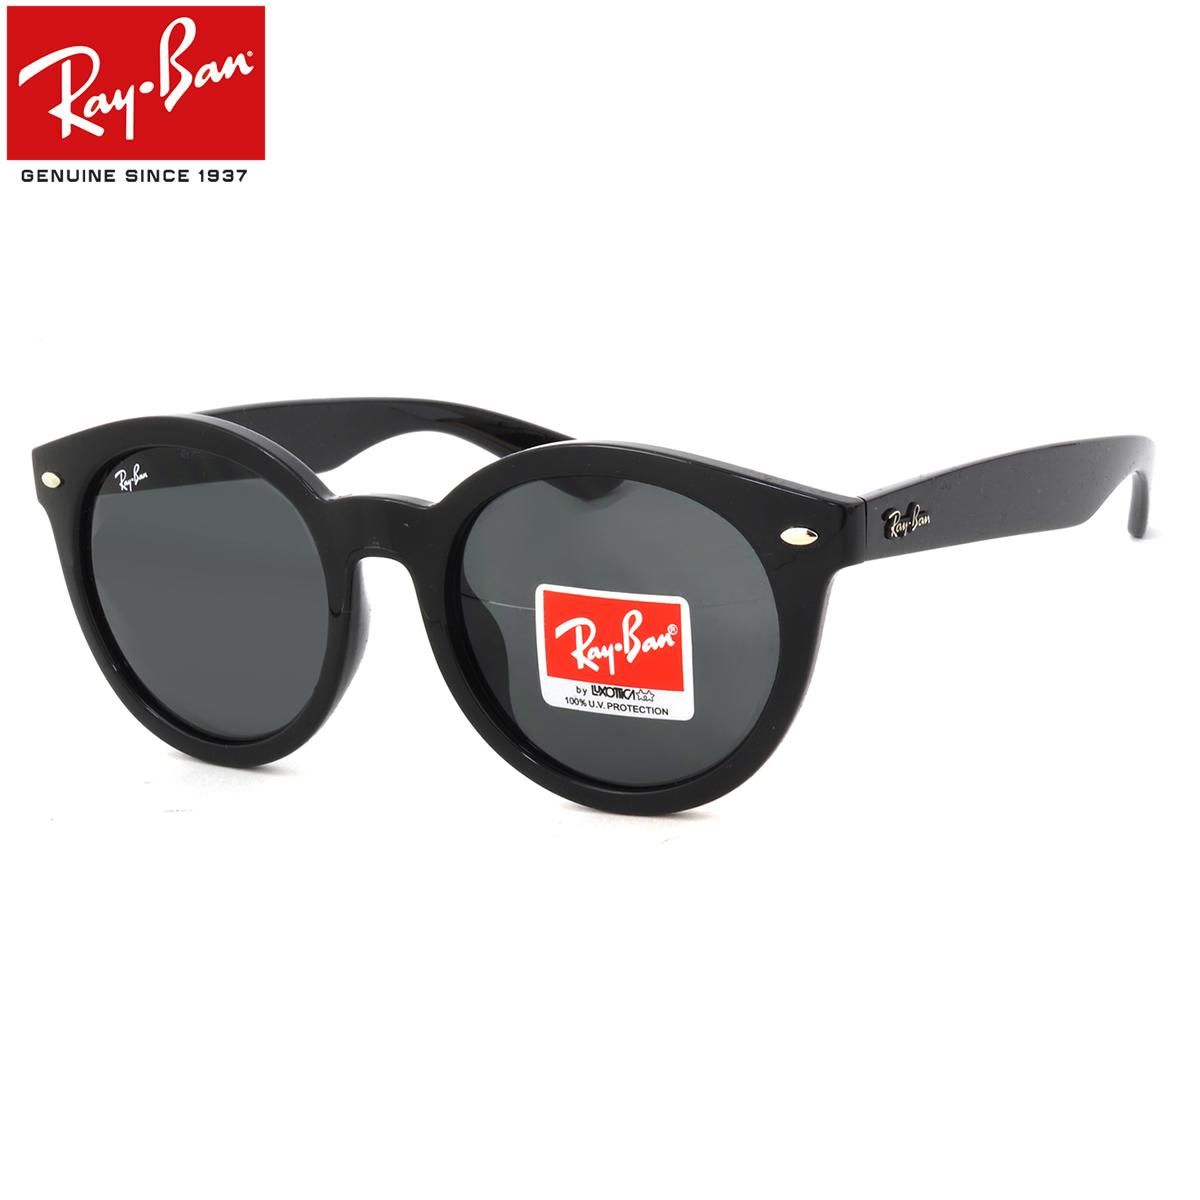 Optical Shop Thats   Rakuten Global Market: Ray-Ban Sunglasses ...